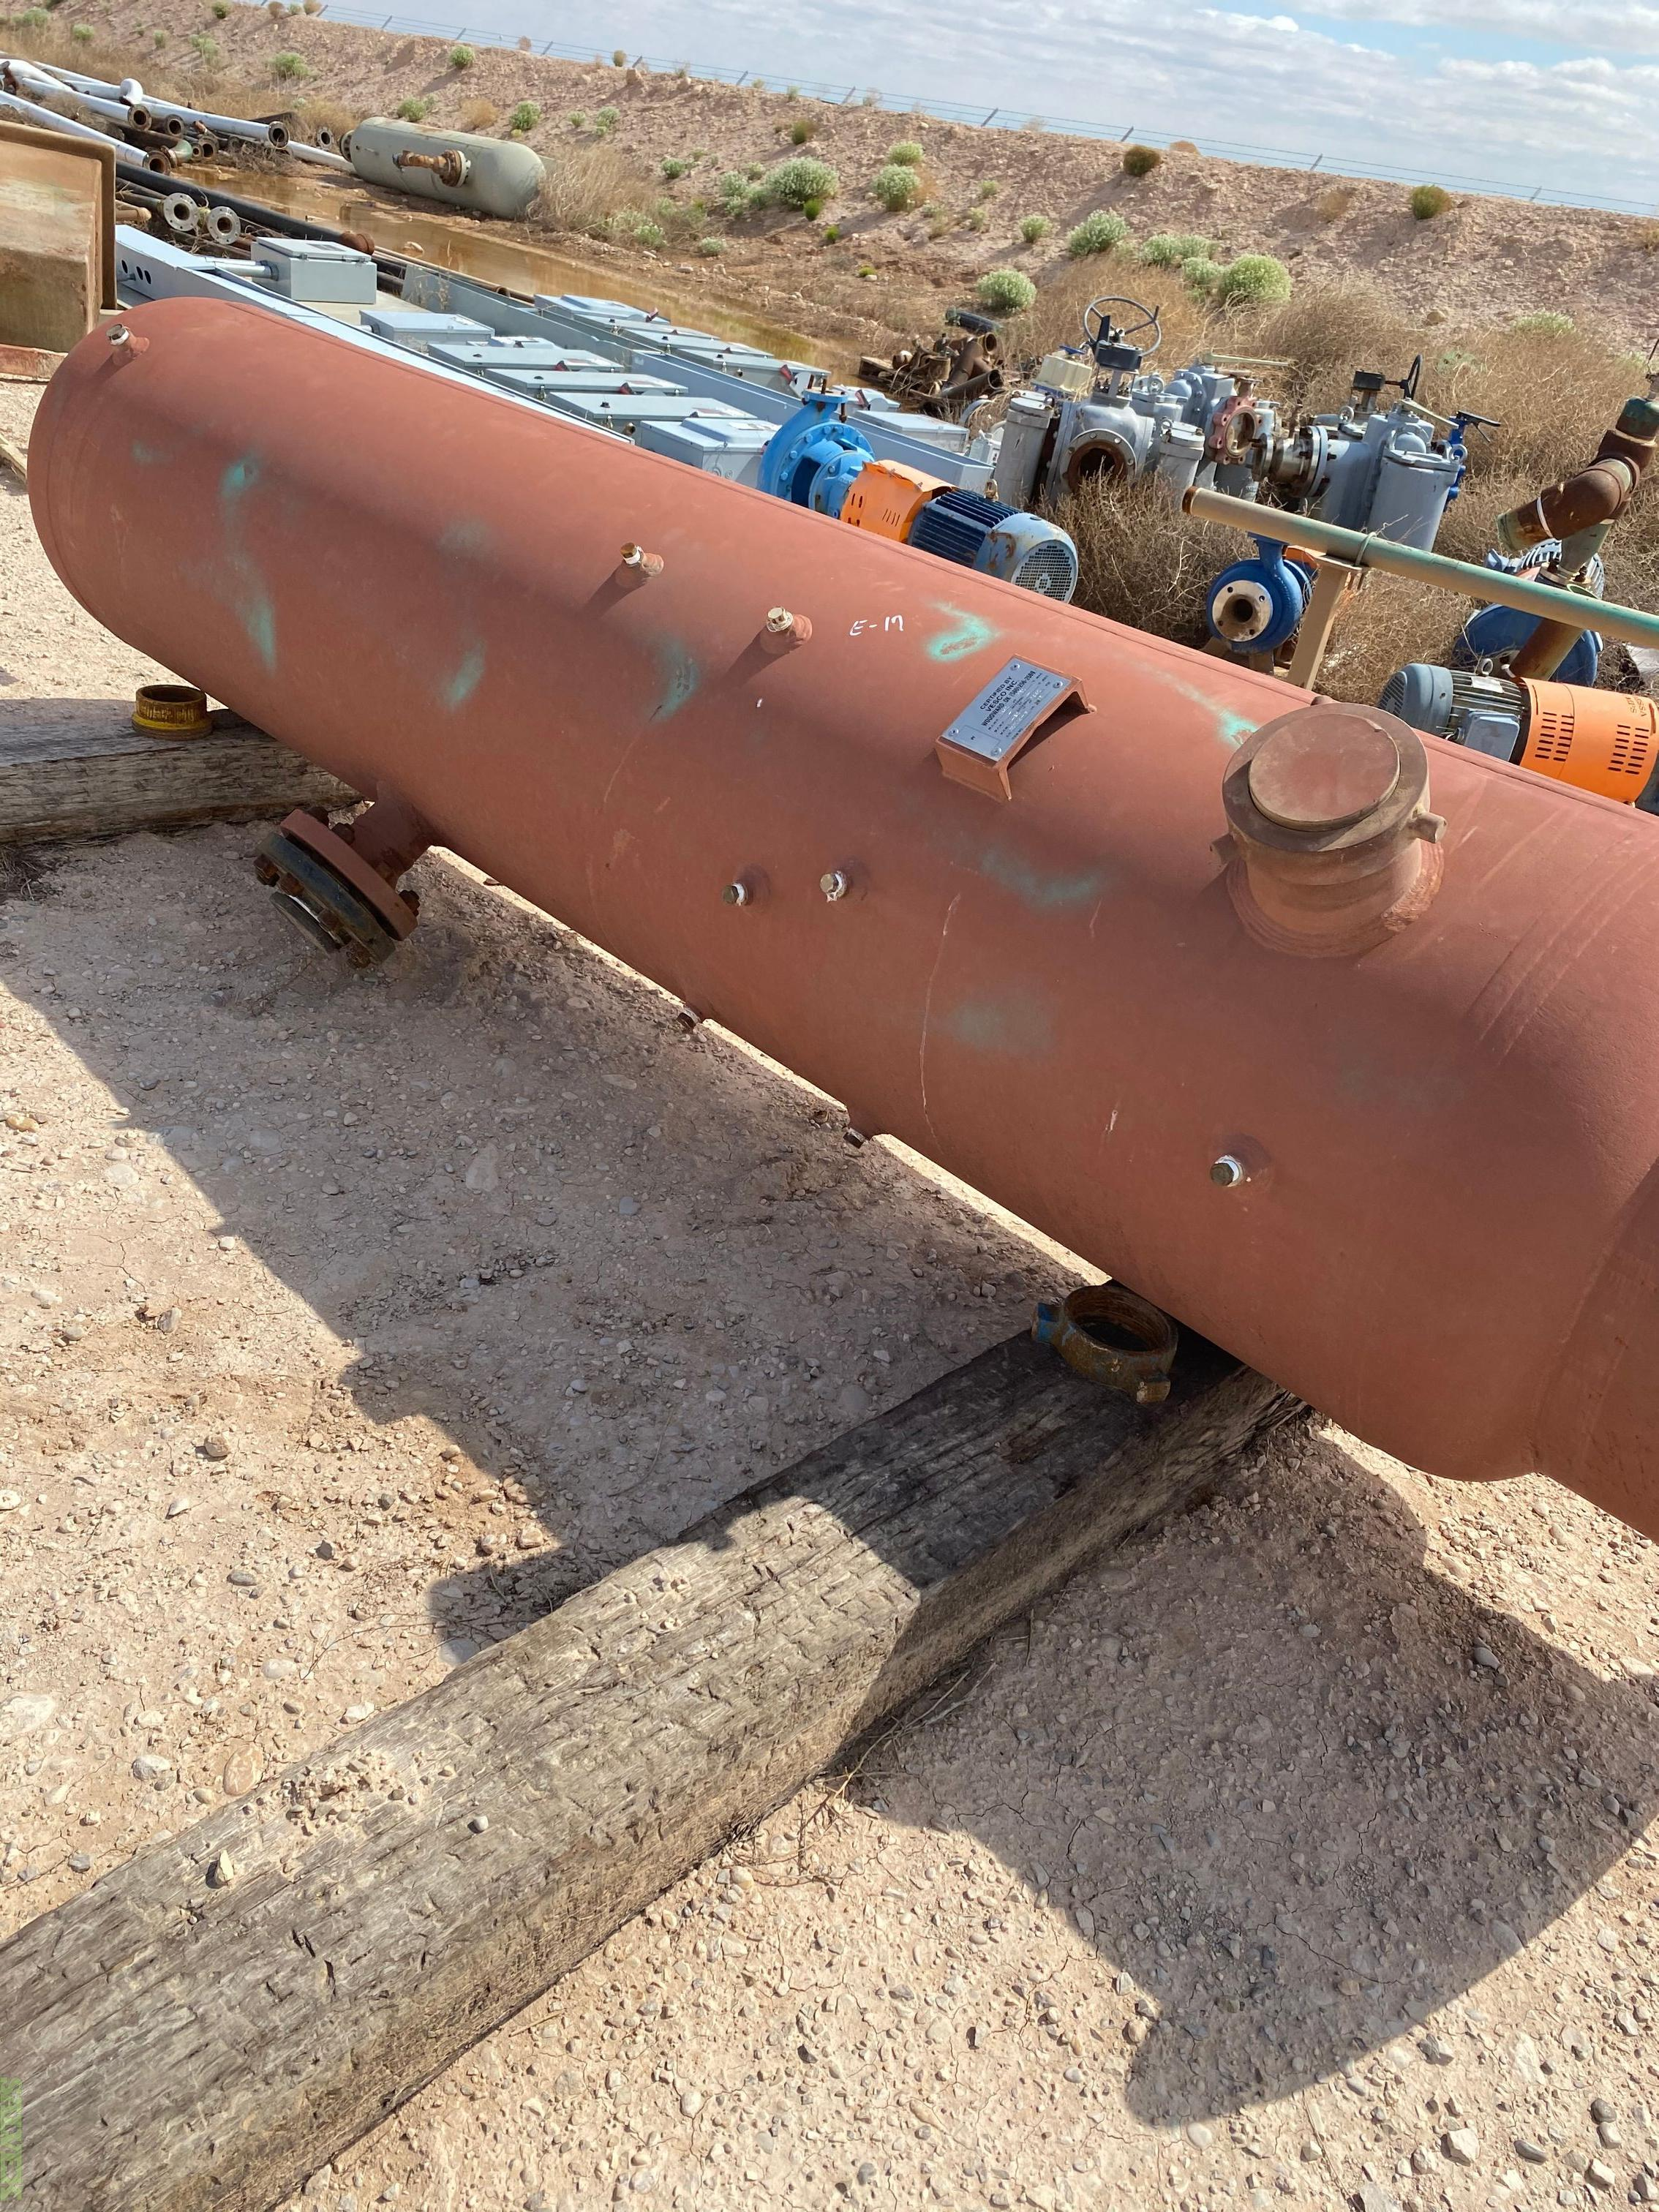 Environmental Tank, Separator, Meter Runs, Sucker Rods, Chemical Tank and More